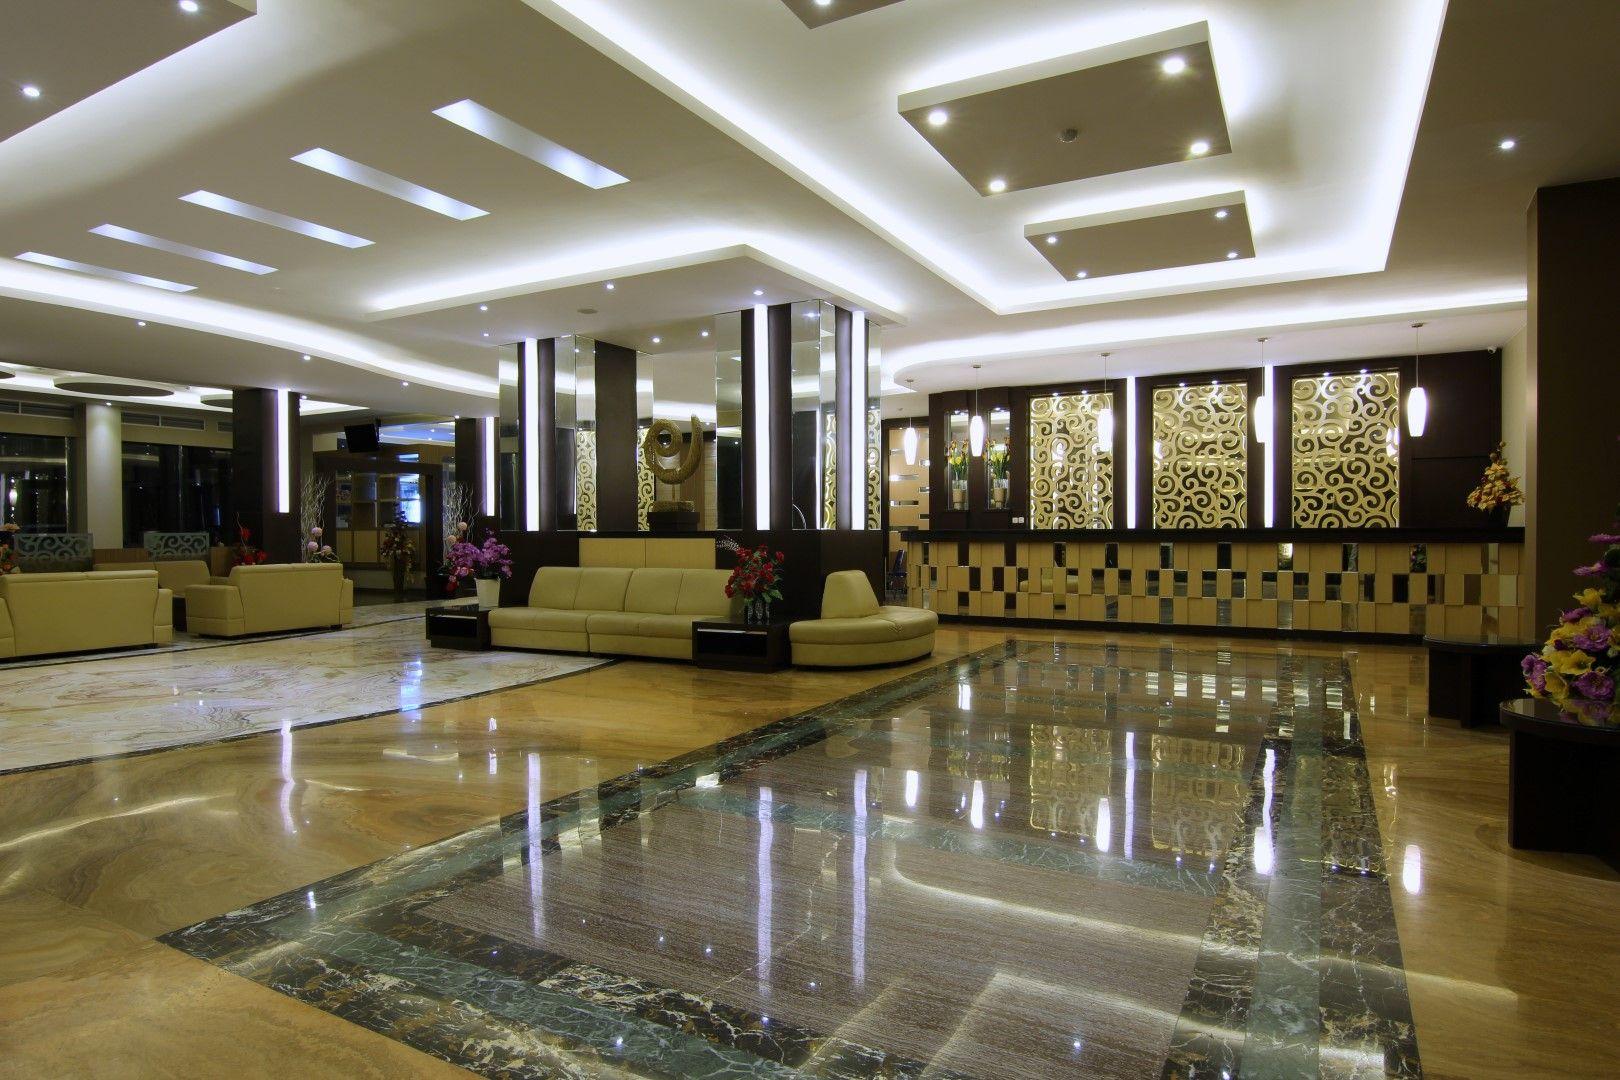 Hotels In Central Java Book Promo Hotel Voucher Louis Kienne Semarang Simpang 5 Dominic Purwokerto